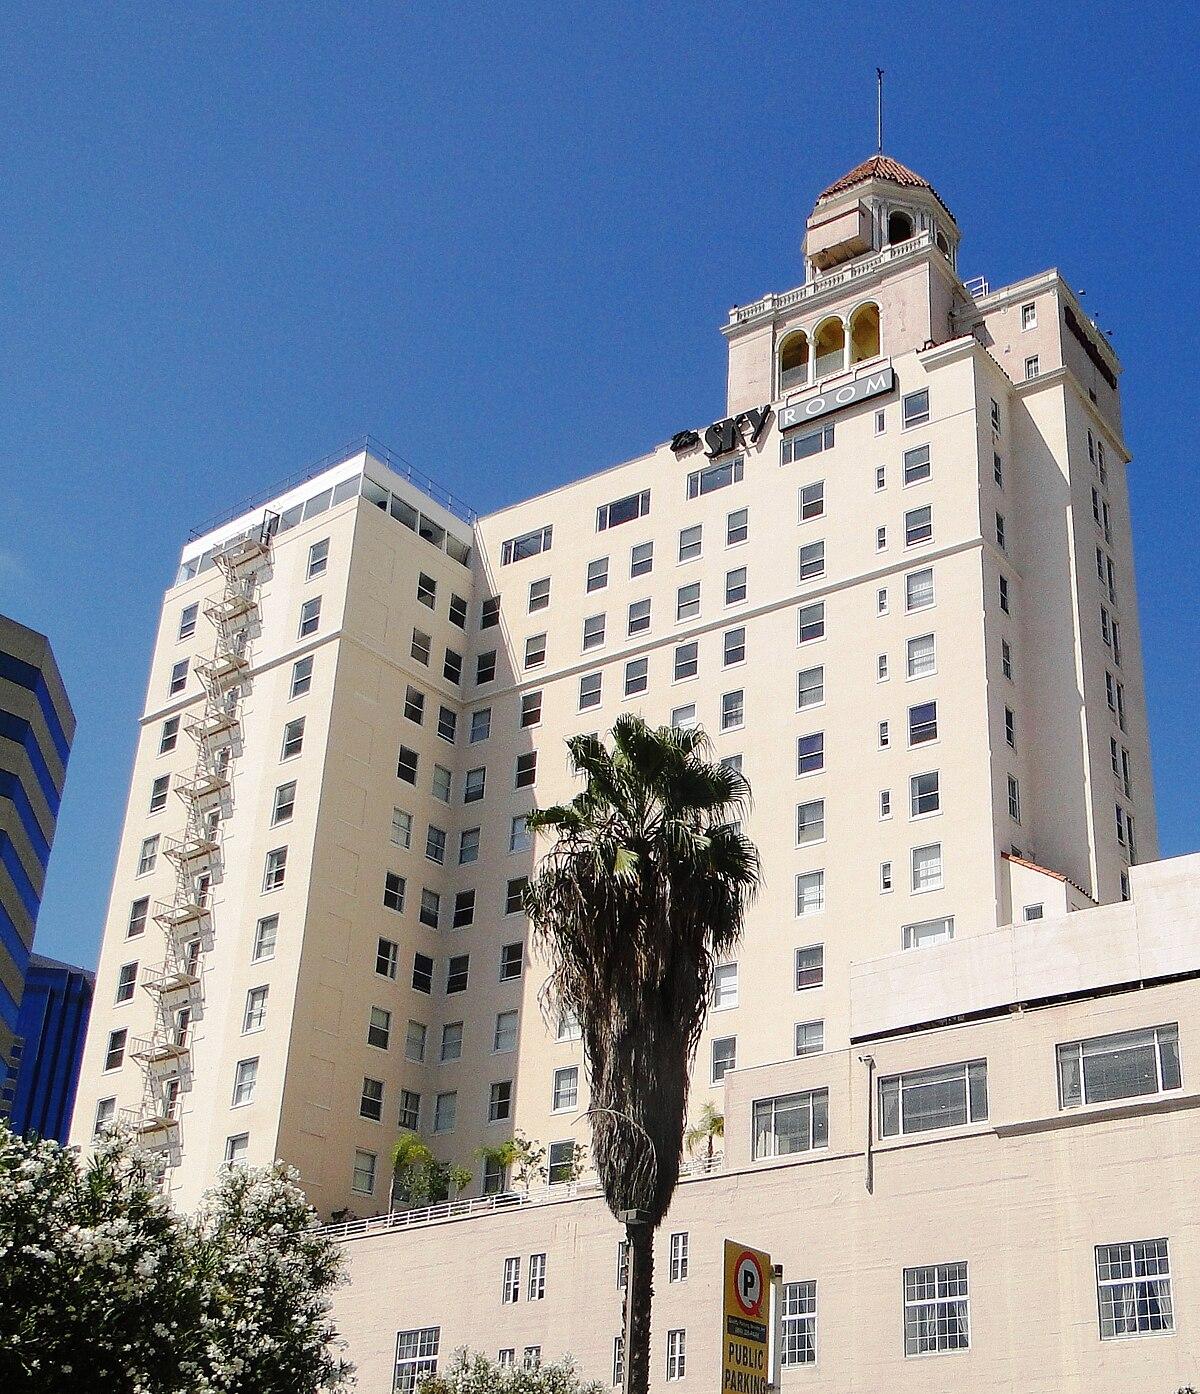 breakers hotel long beach california wikipedia. Black Bedroom Furniture Sets. Home Design Ideas